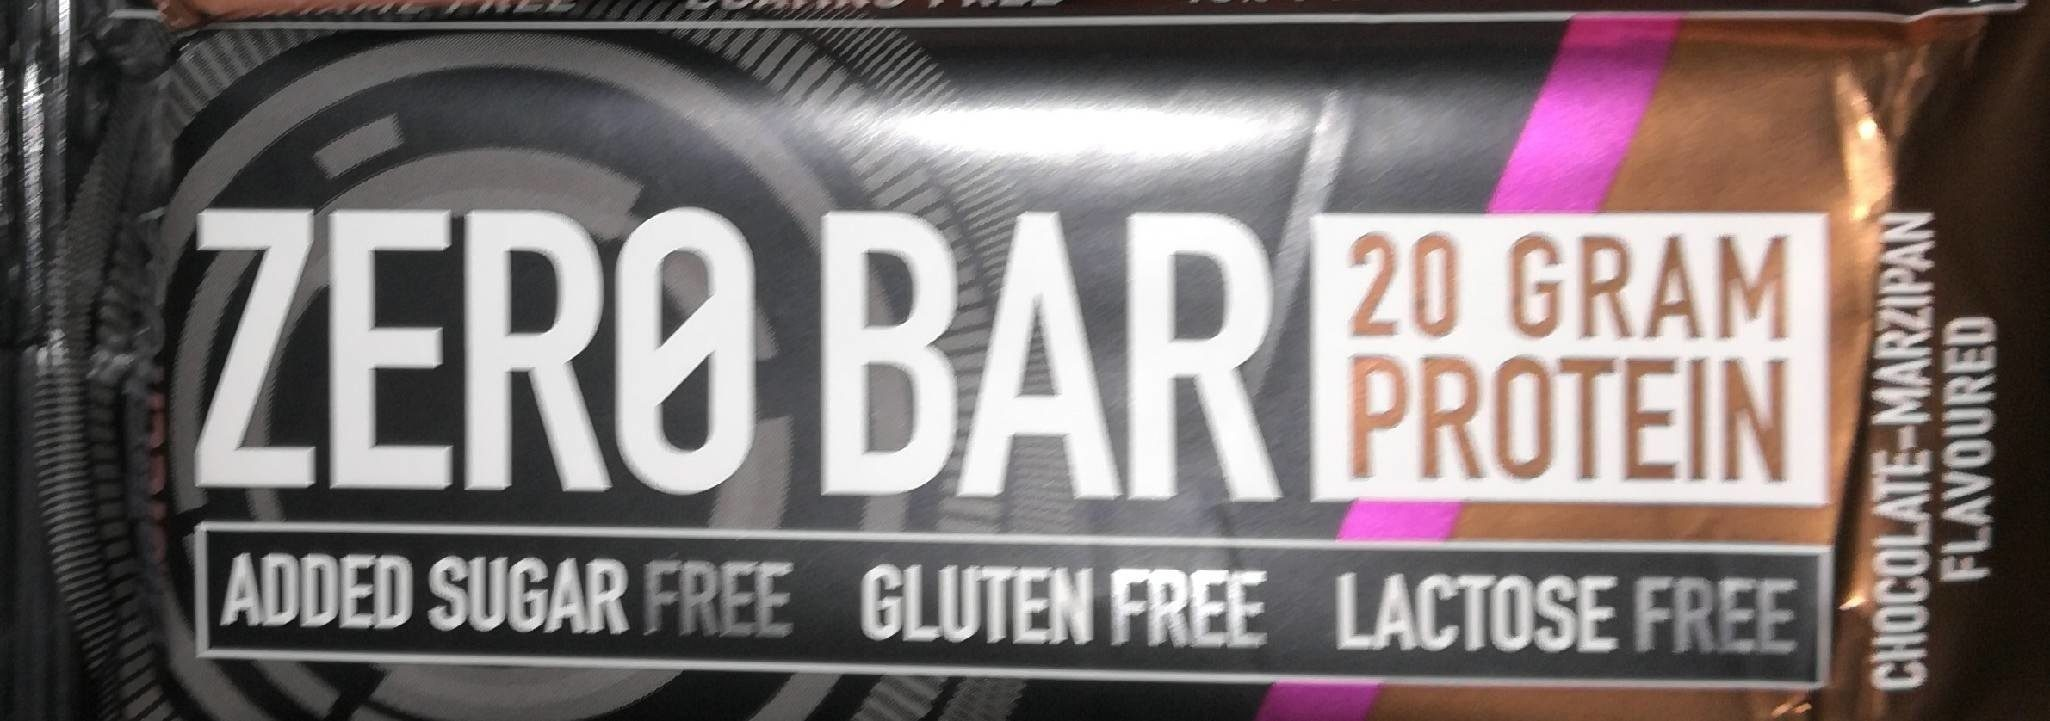 Zero bar - Product